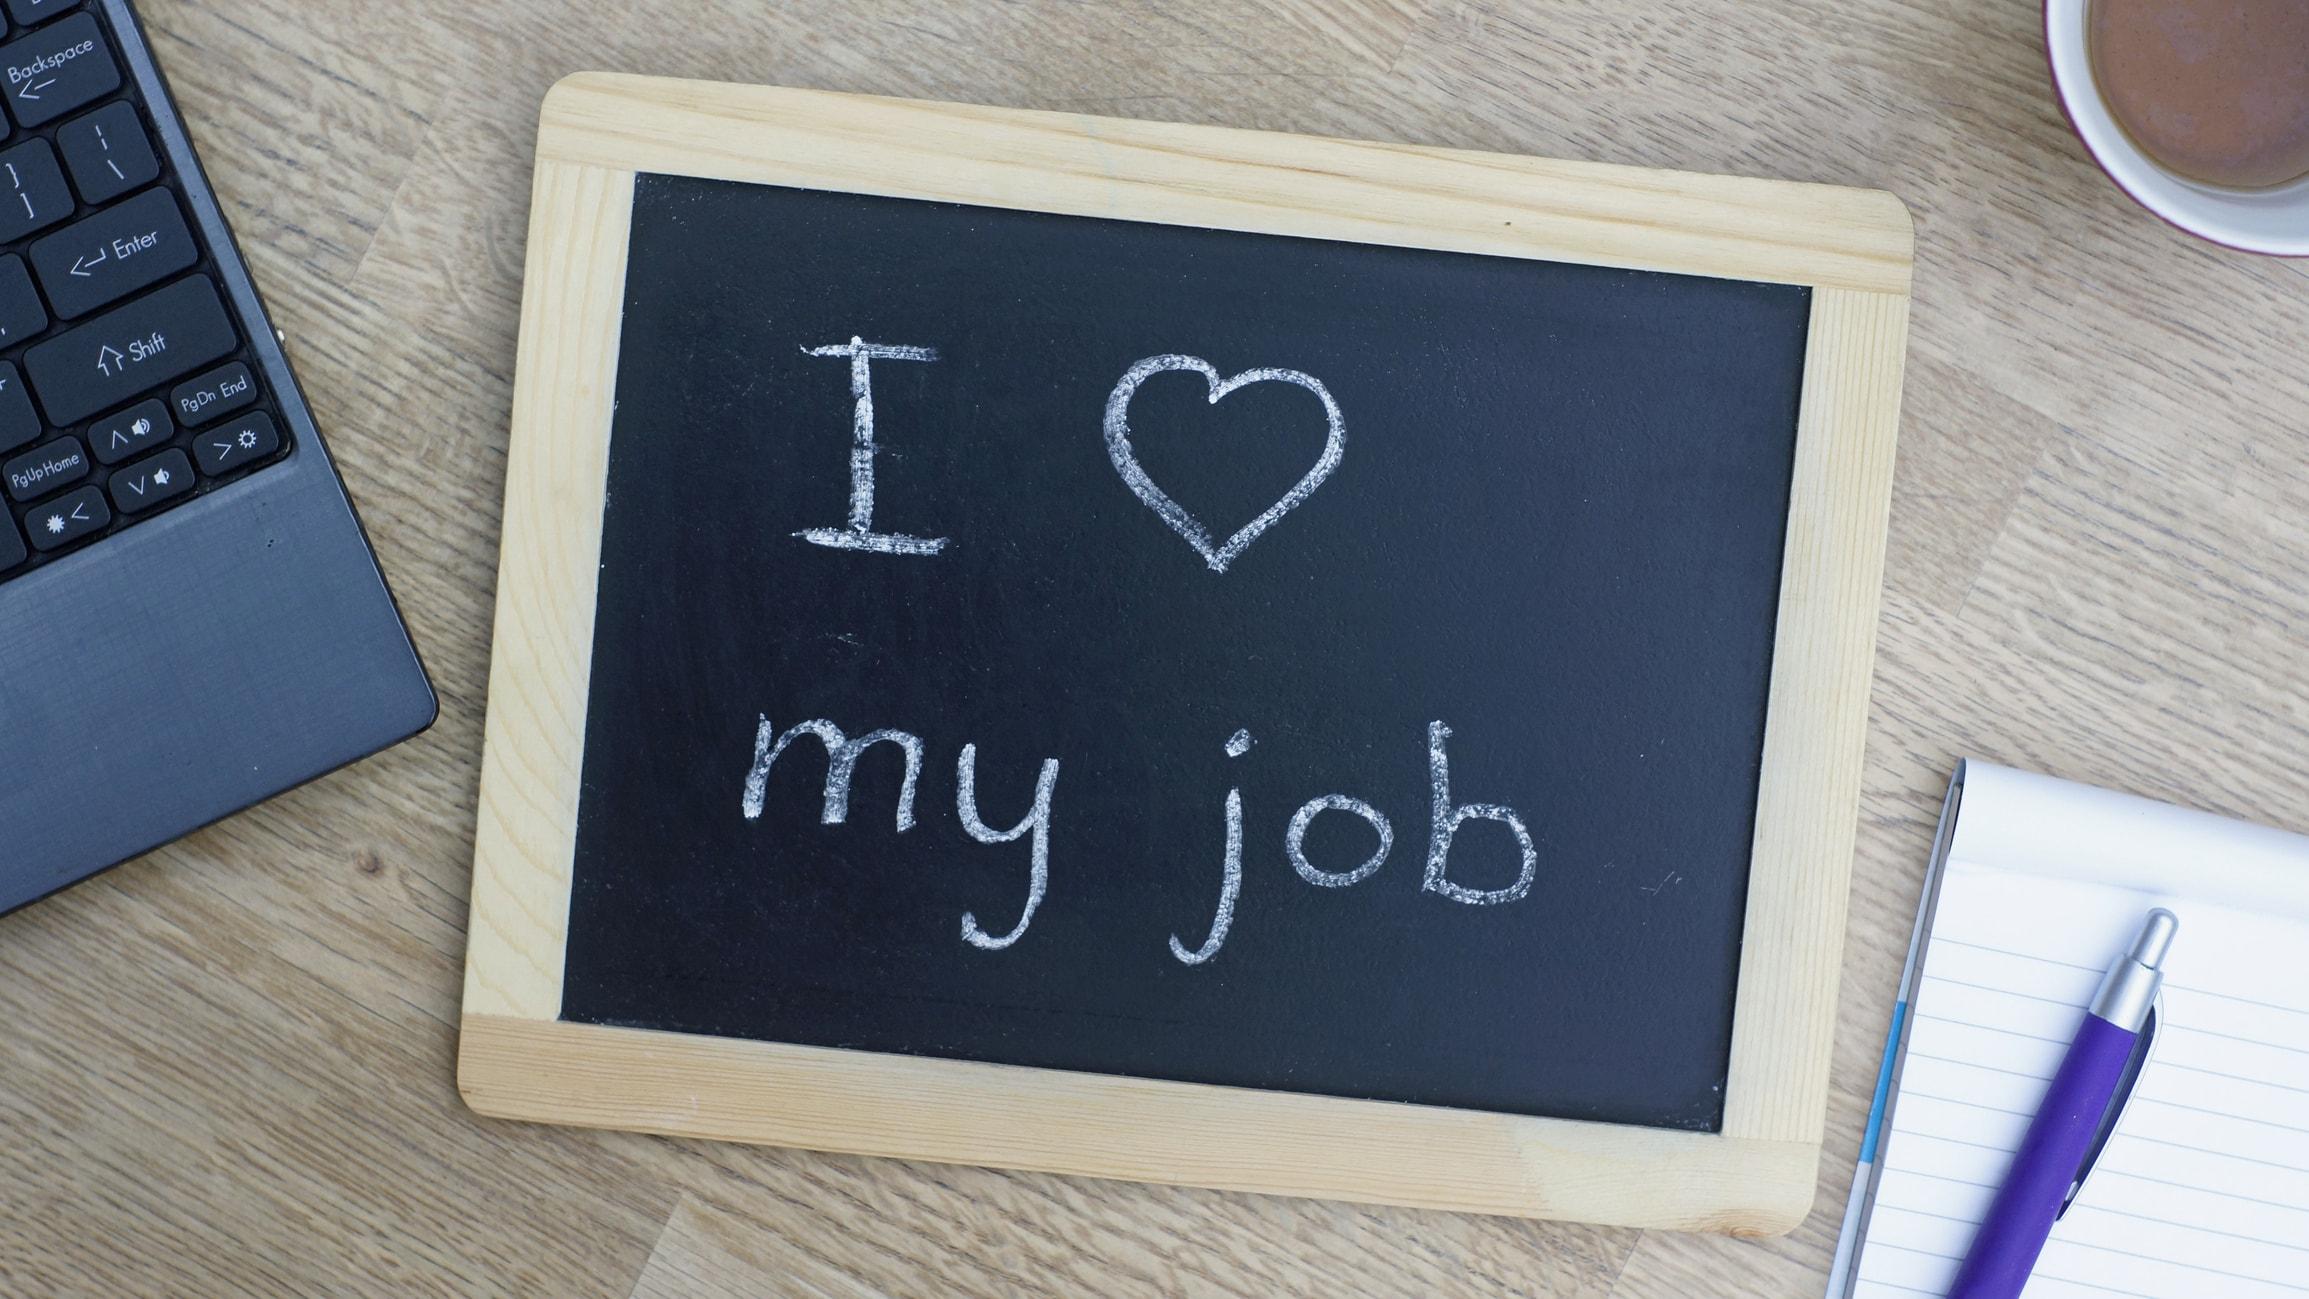 Chercher_un_job_passer_entretien_Oney_blog.jpg